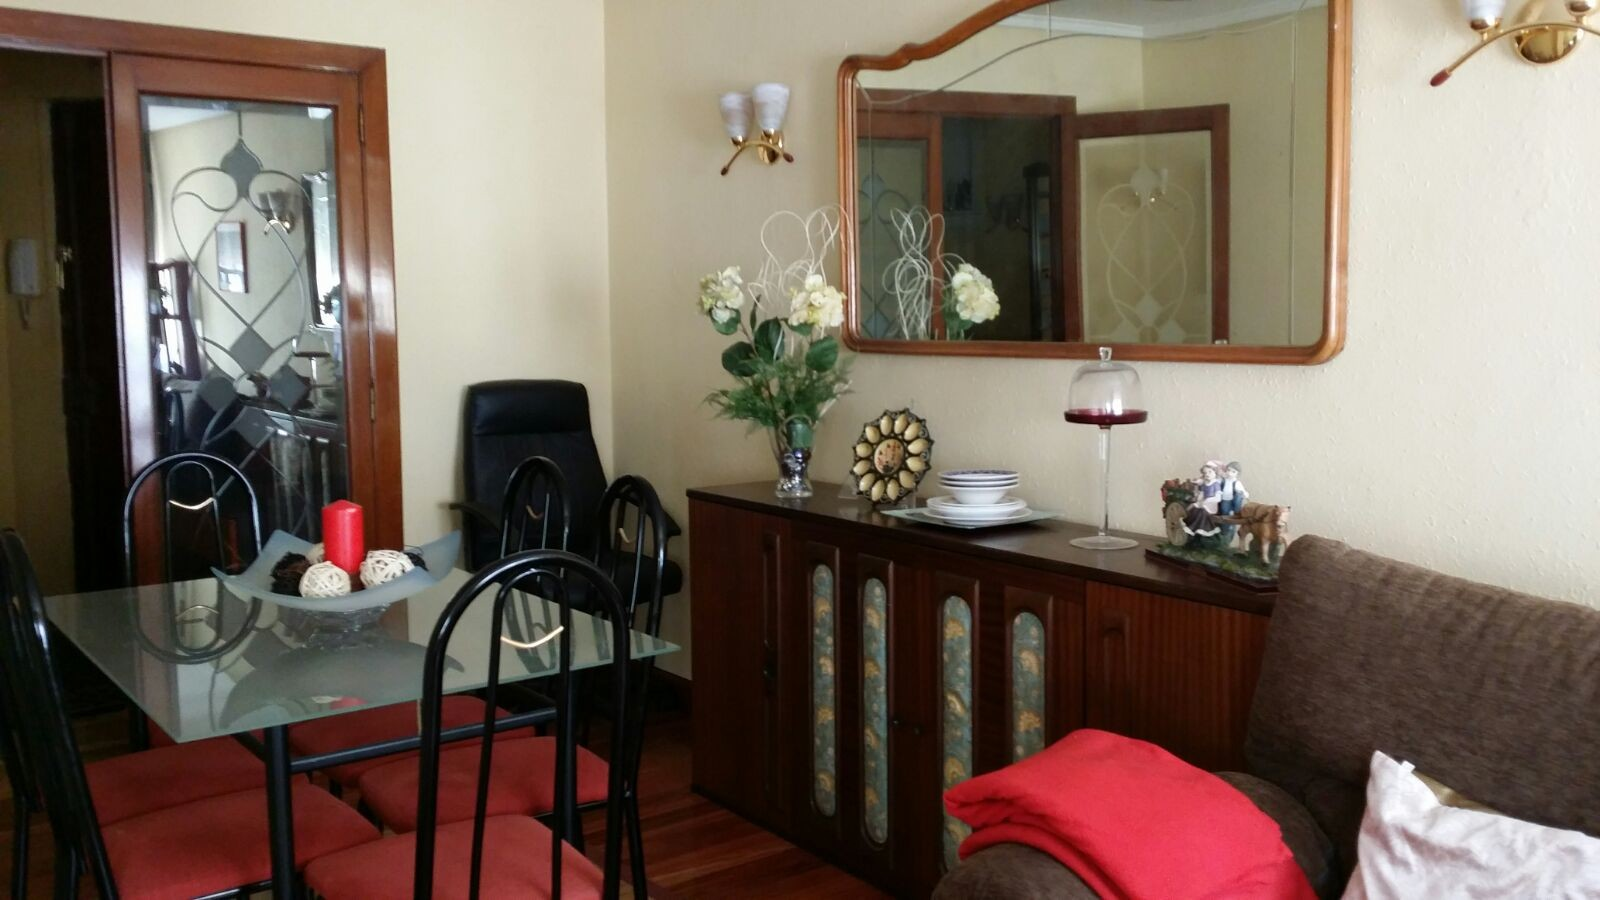 Alquiler de habitacion a estudiantes alquiler habitaciones bilbao - Alquiler habitacion donosti ...